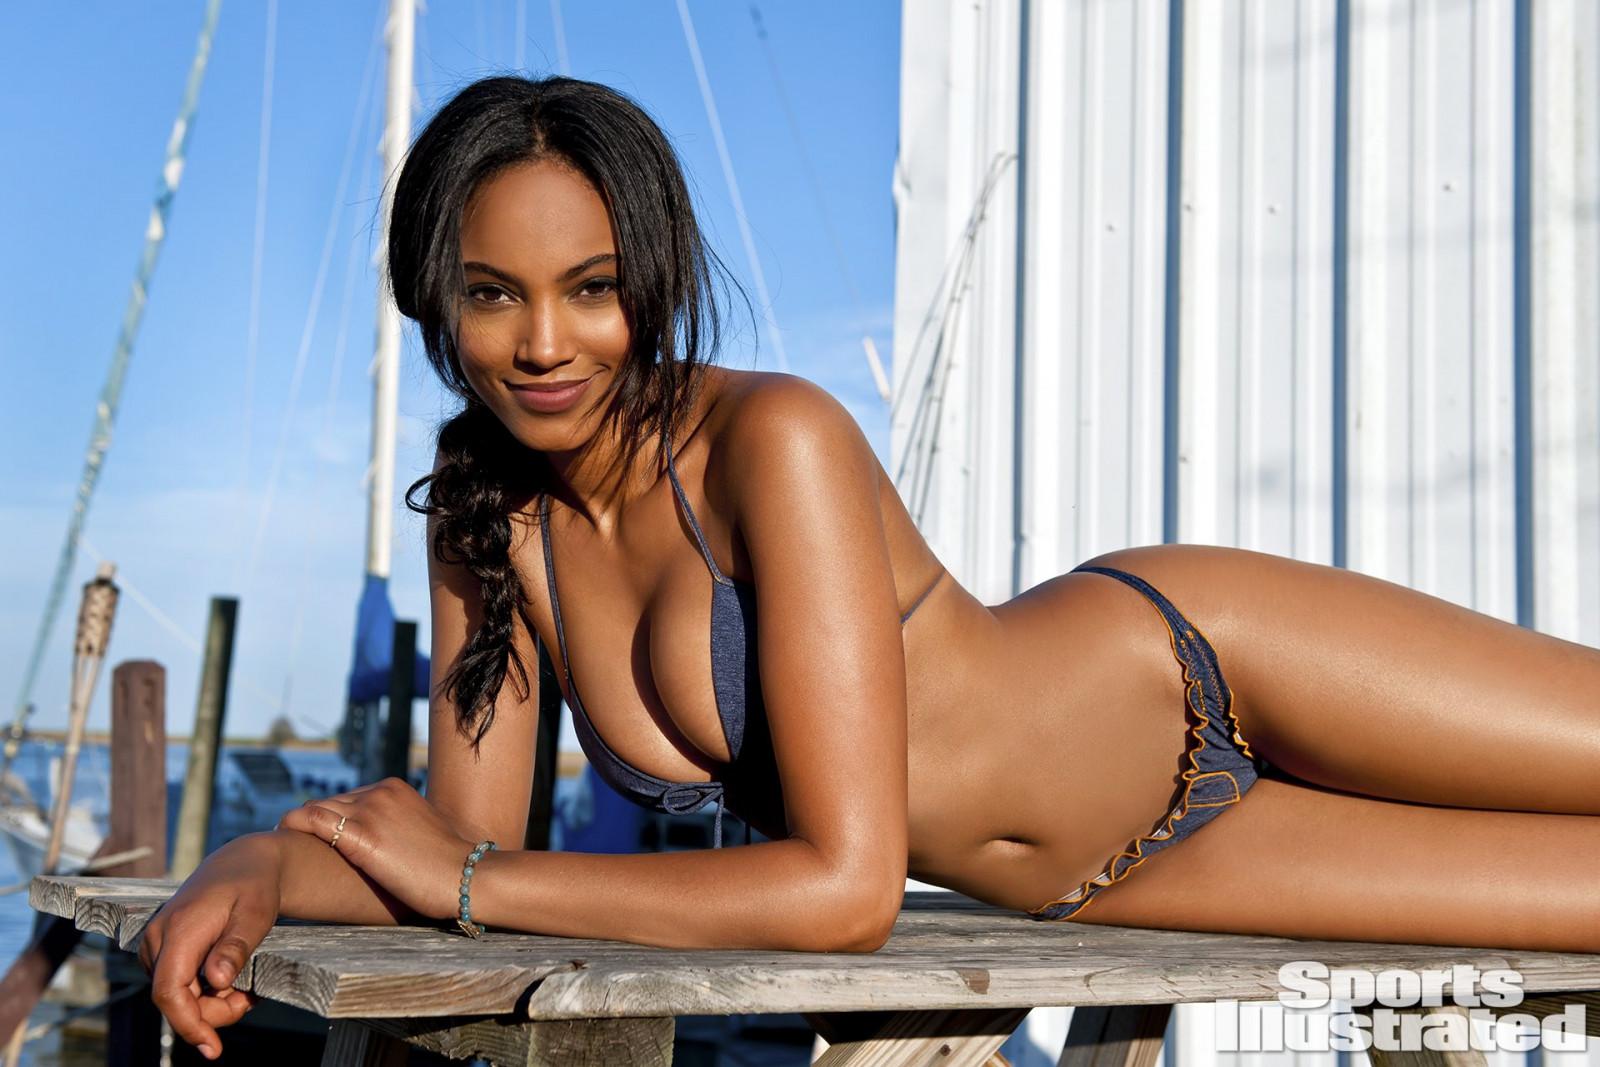 Ebony model pics